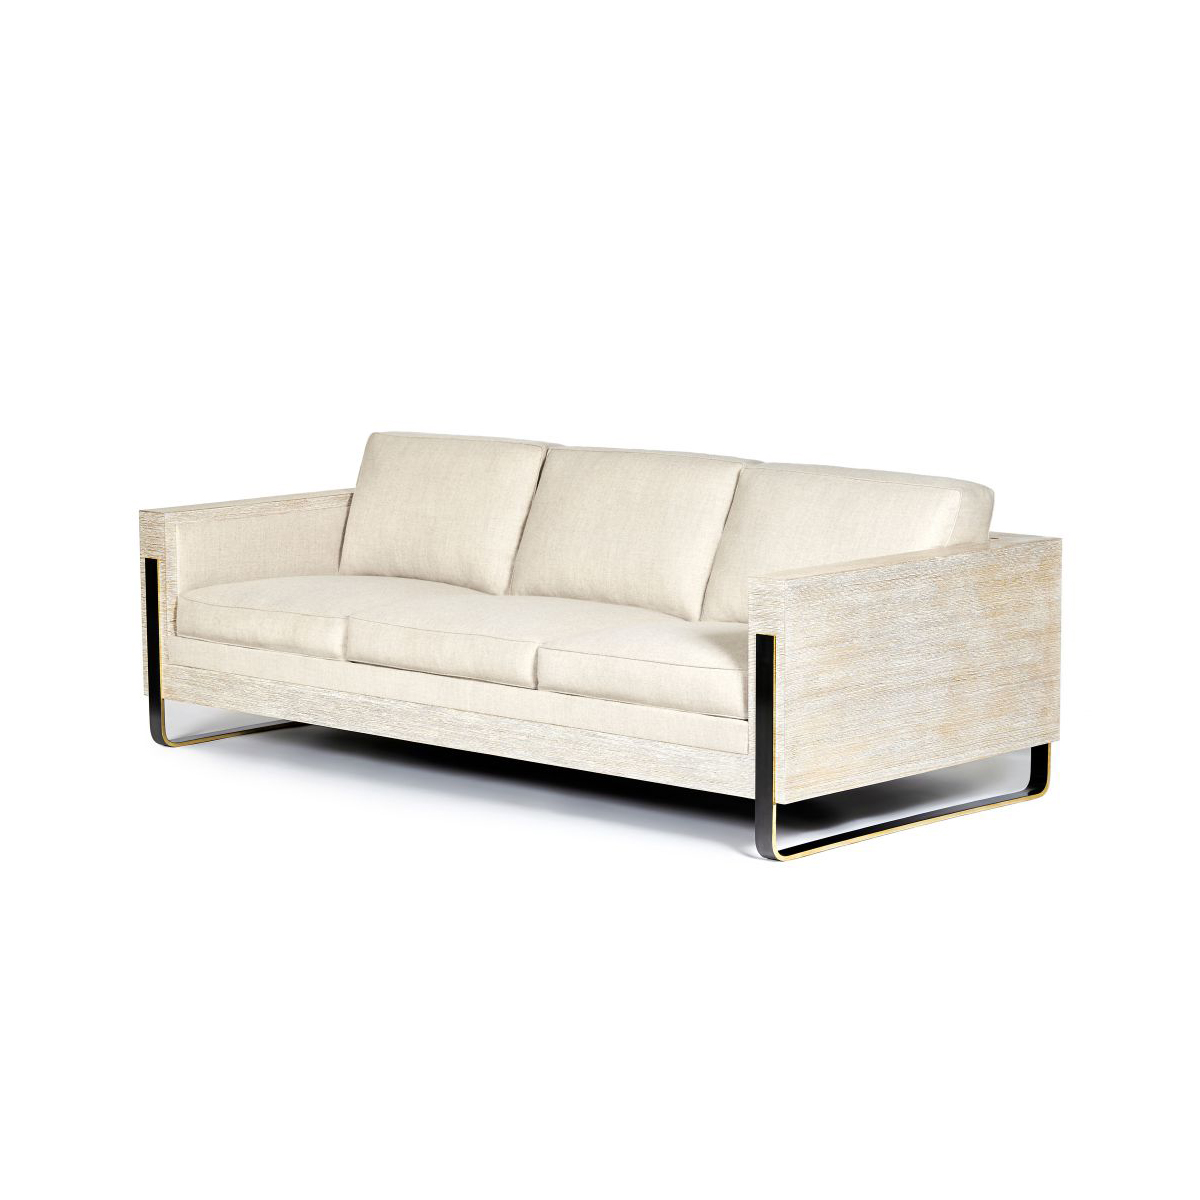 Duna Sofa by Jean De Merry